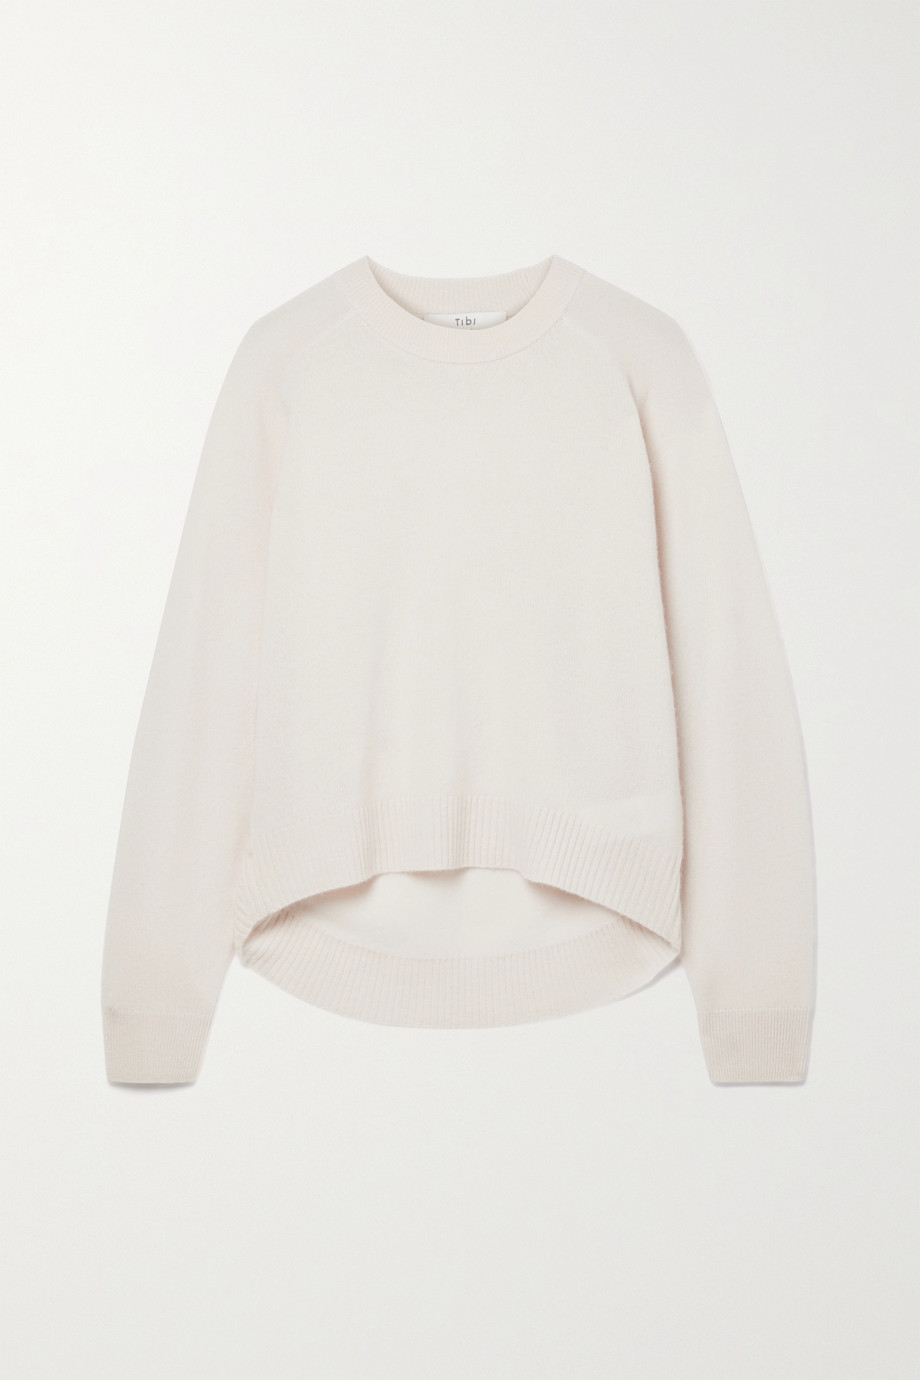 Tibi Convertible cutout cashmere sweater